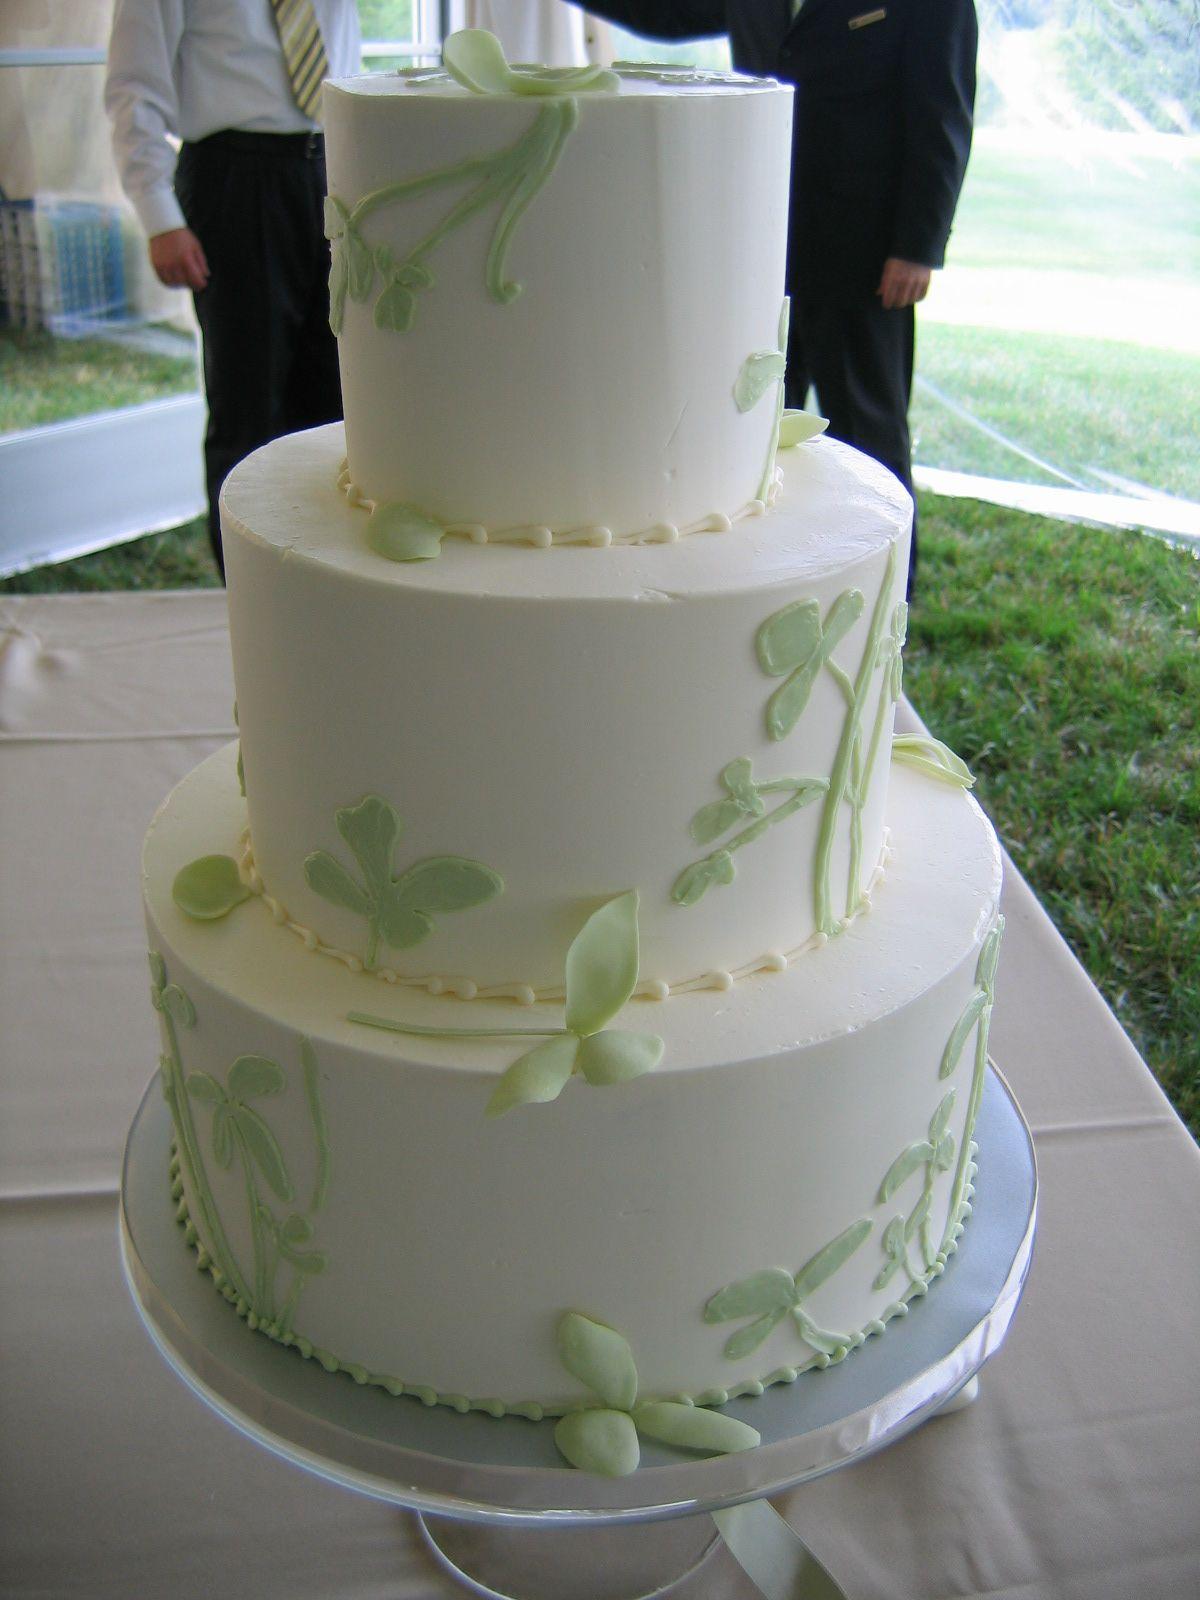 Magpies Bakery Knoxville, TN Custom buttercream wedding